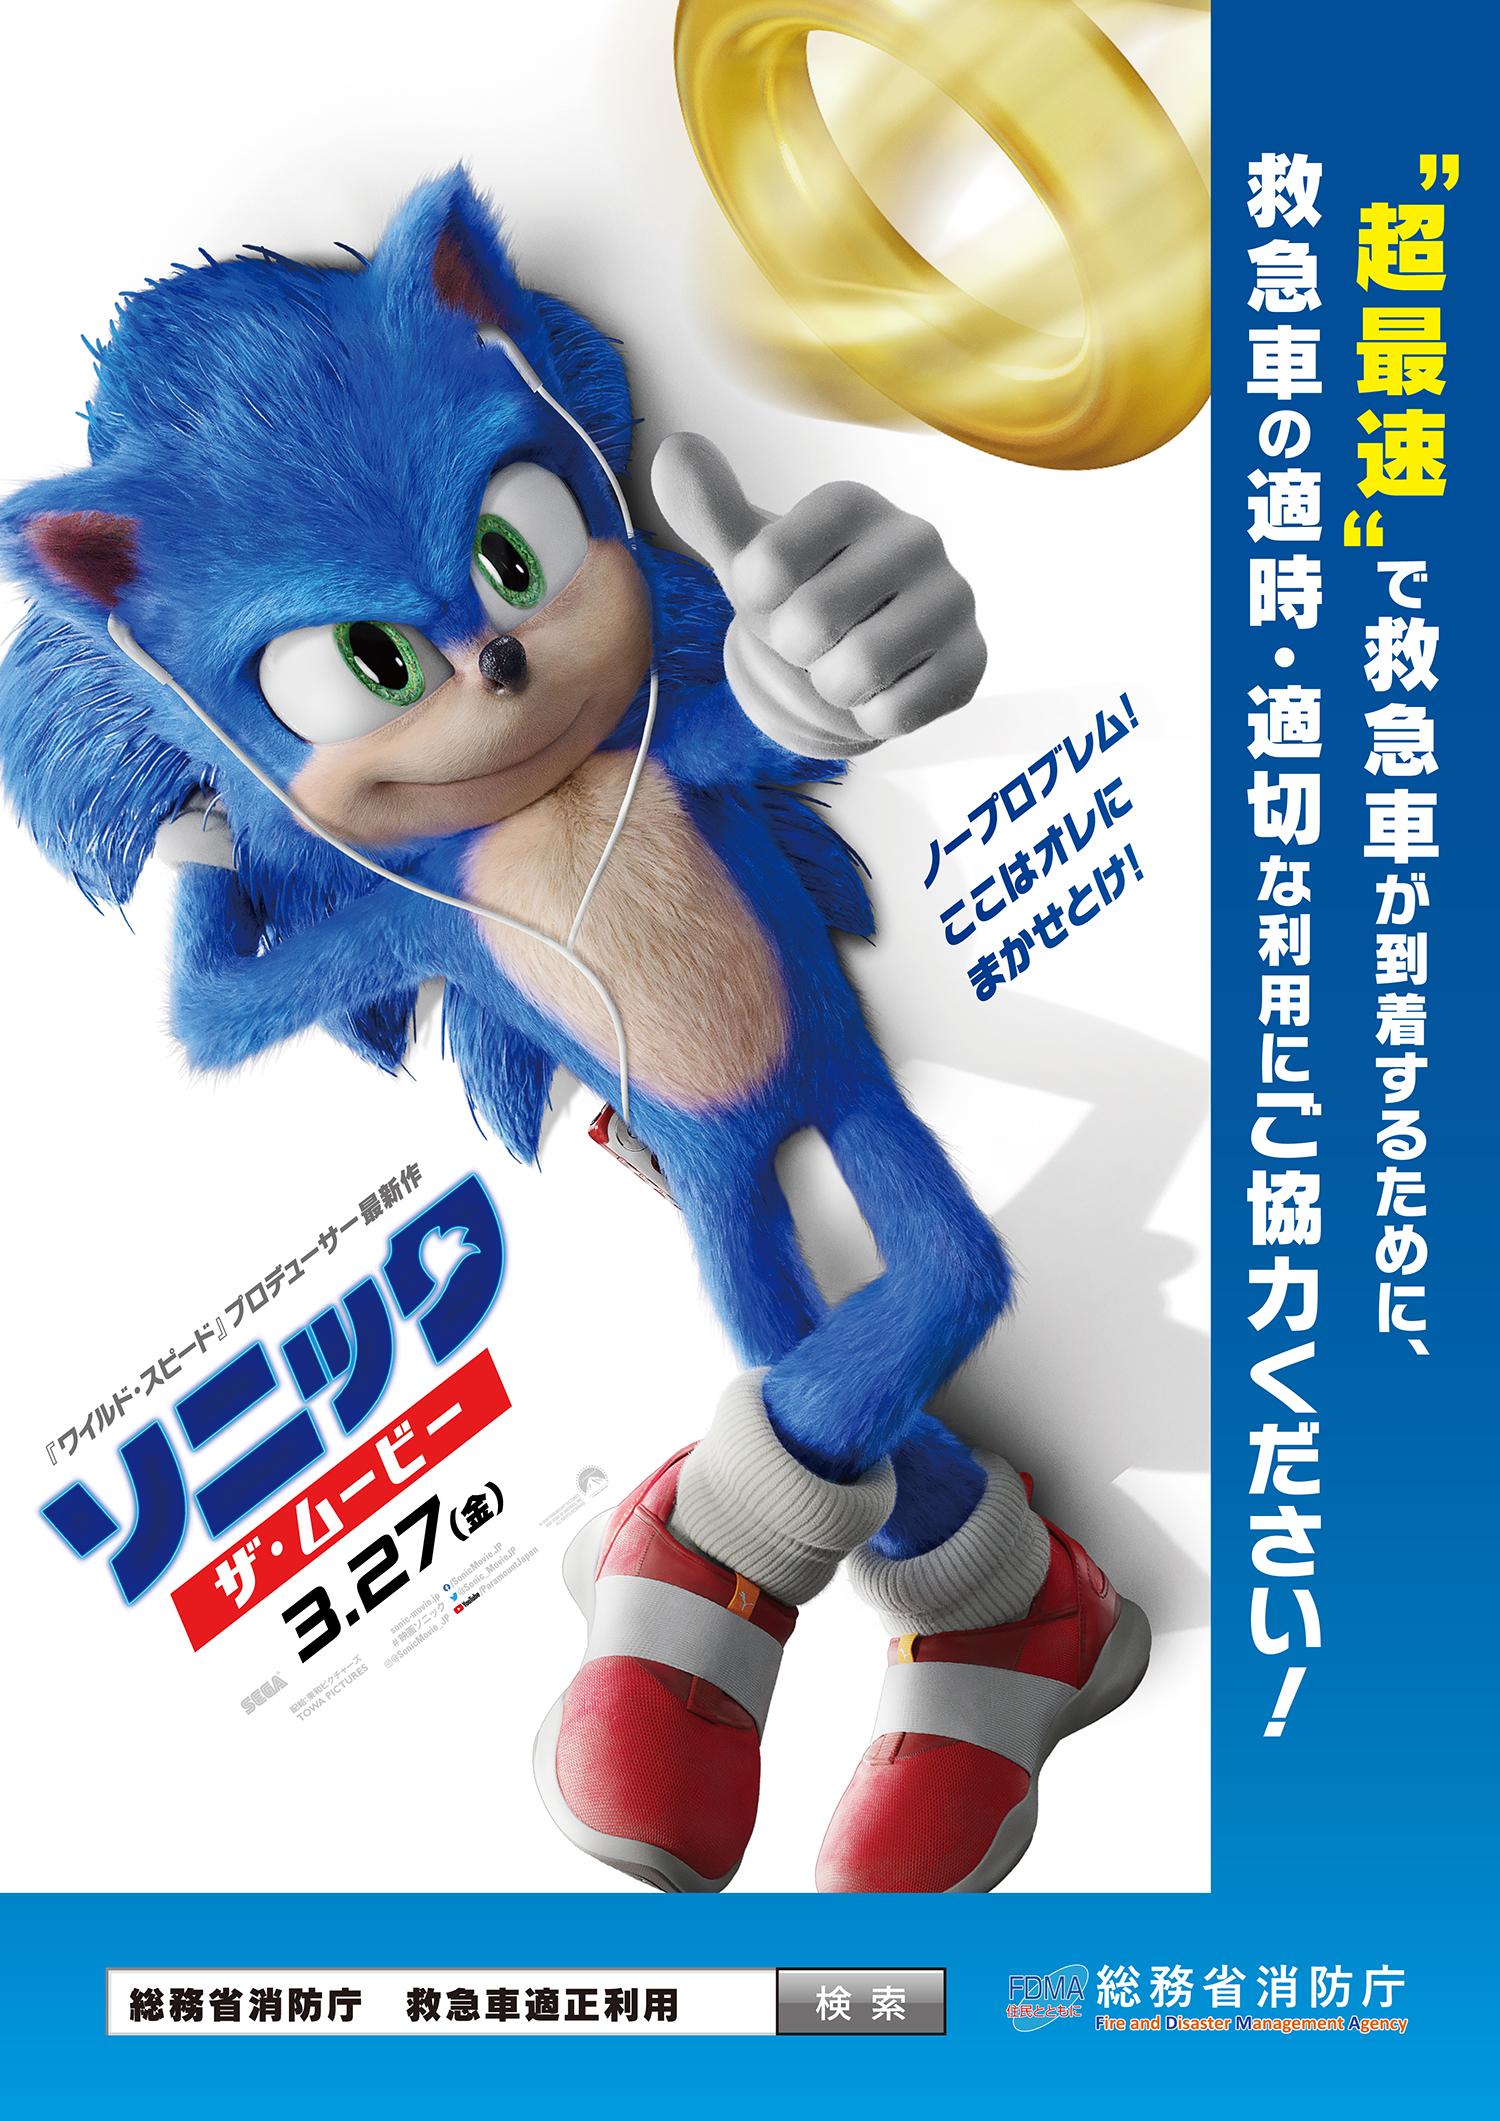 Sonic_keimou_0213_ol